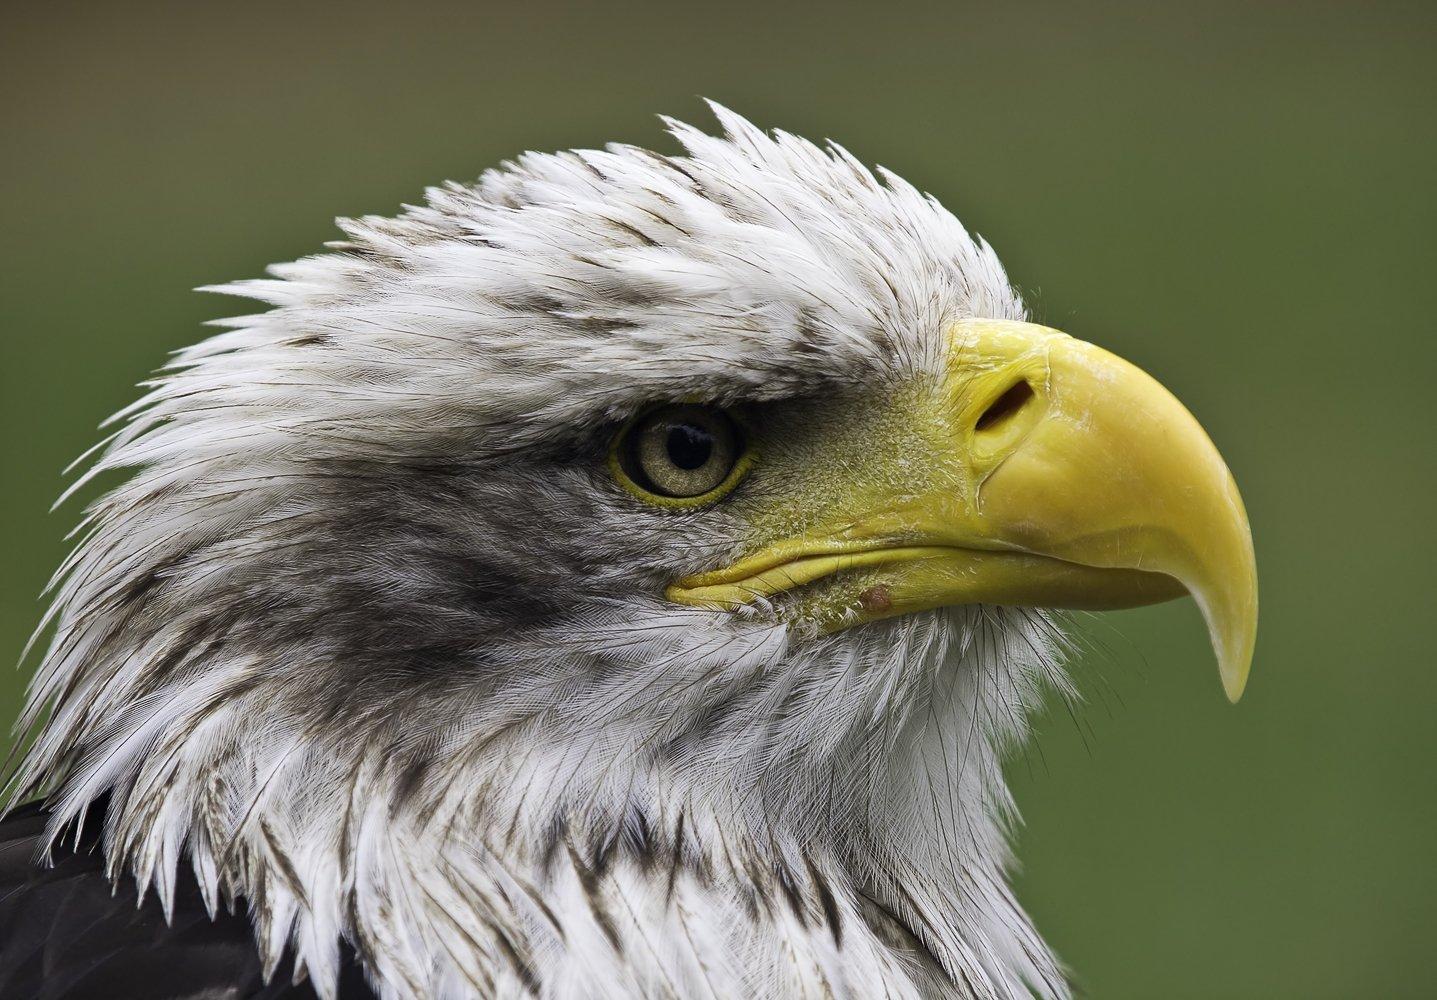 American Bald Eagle wallpaper   ForWallpapercom 1437x1000